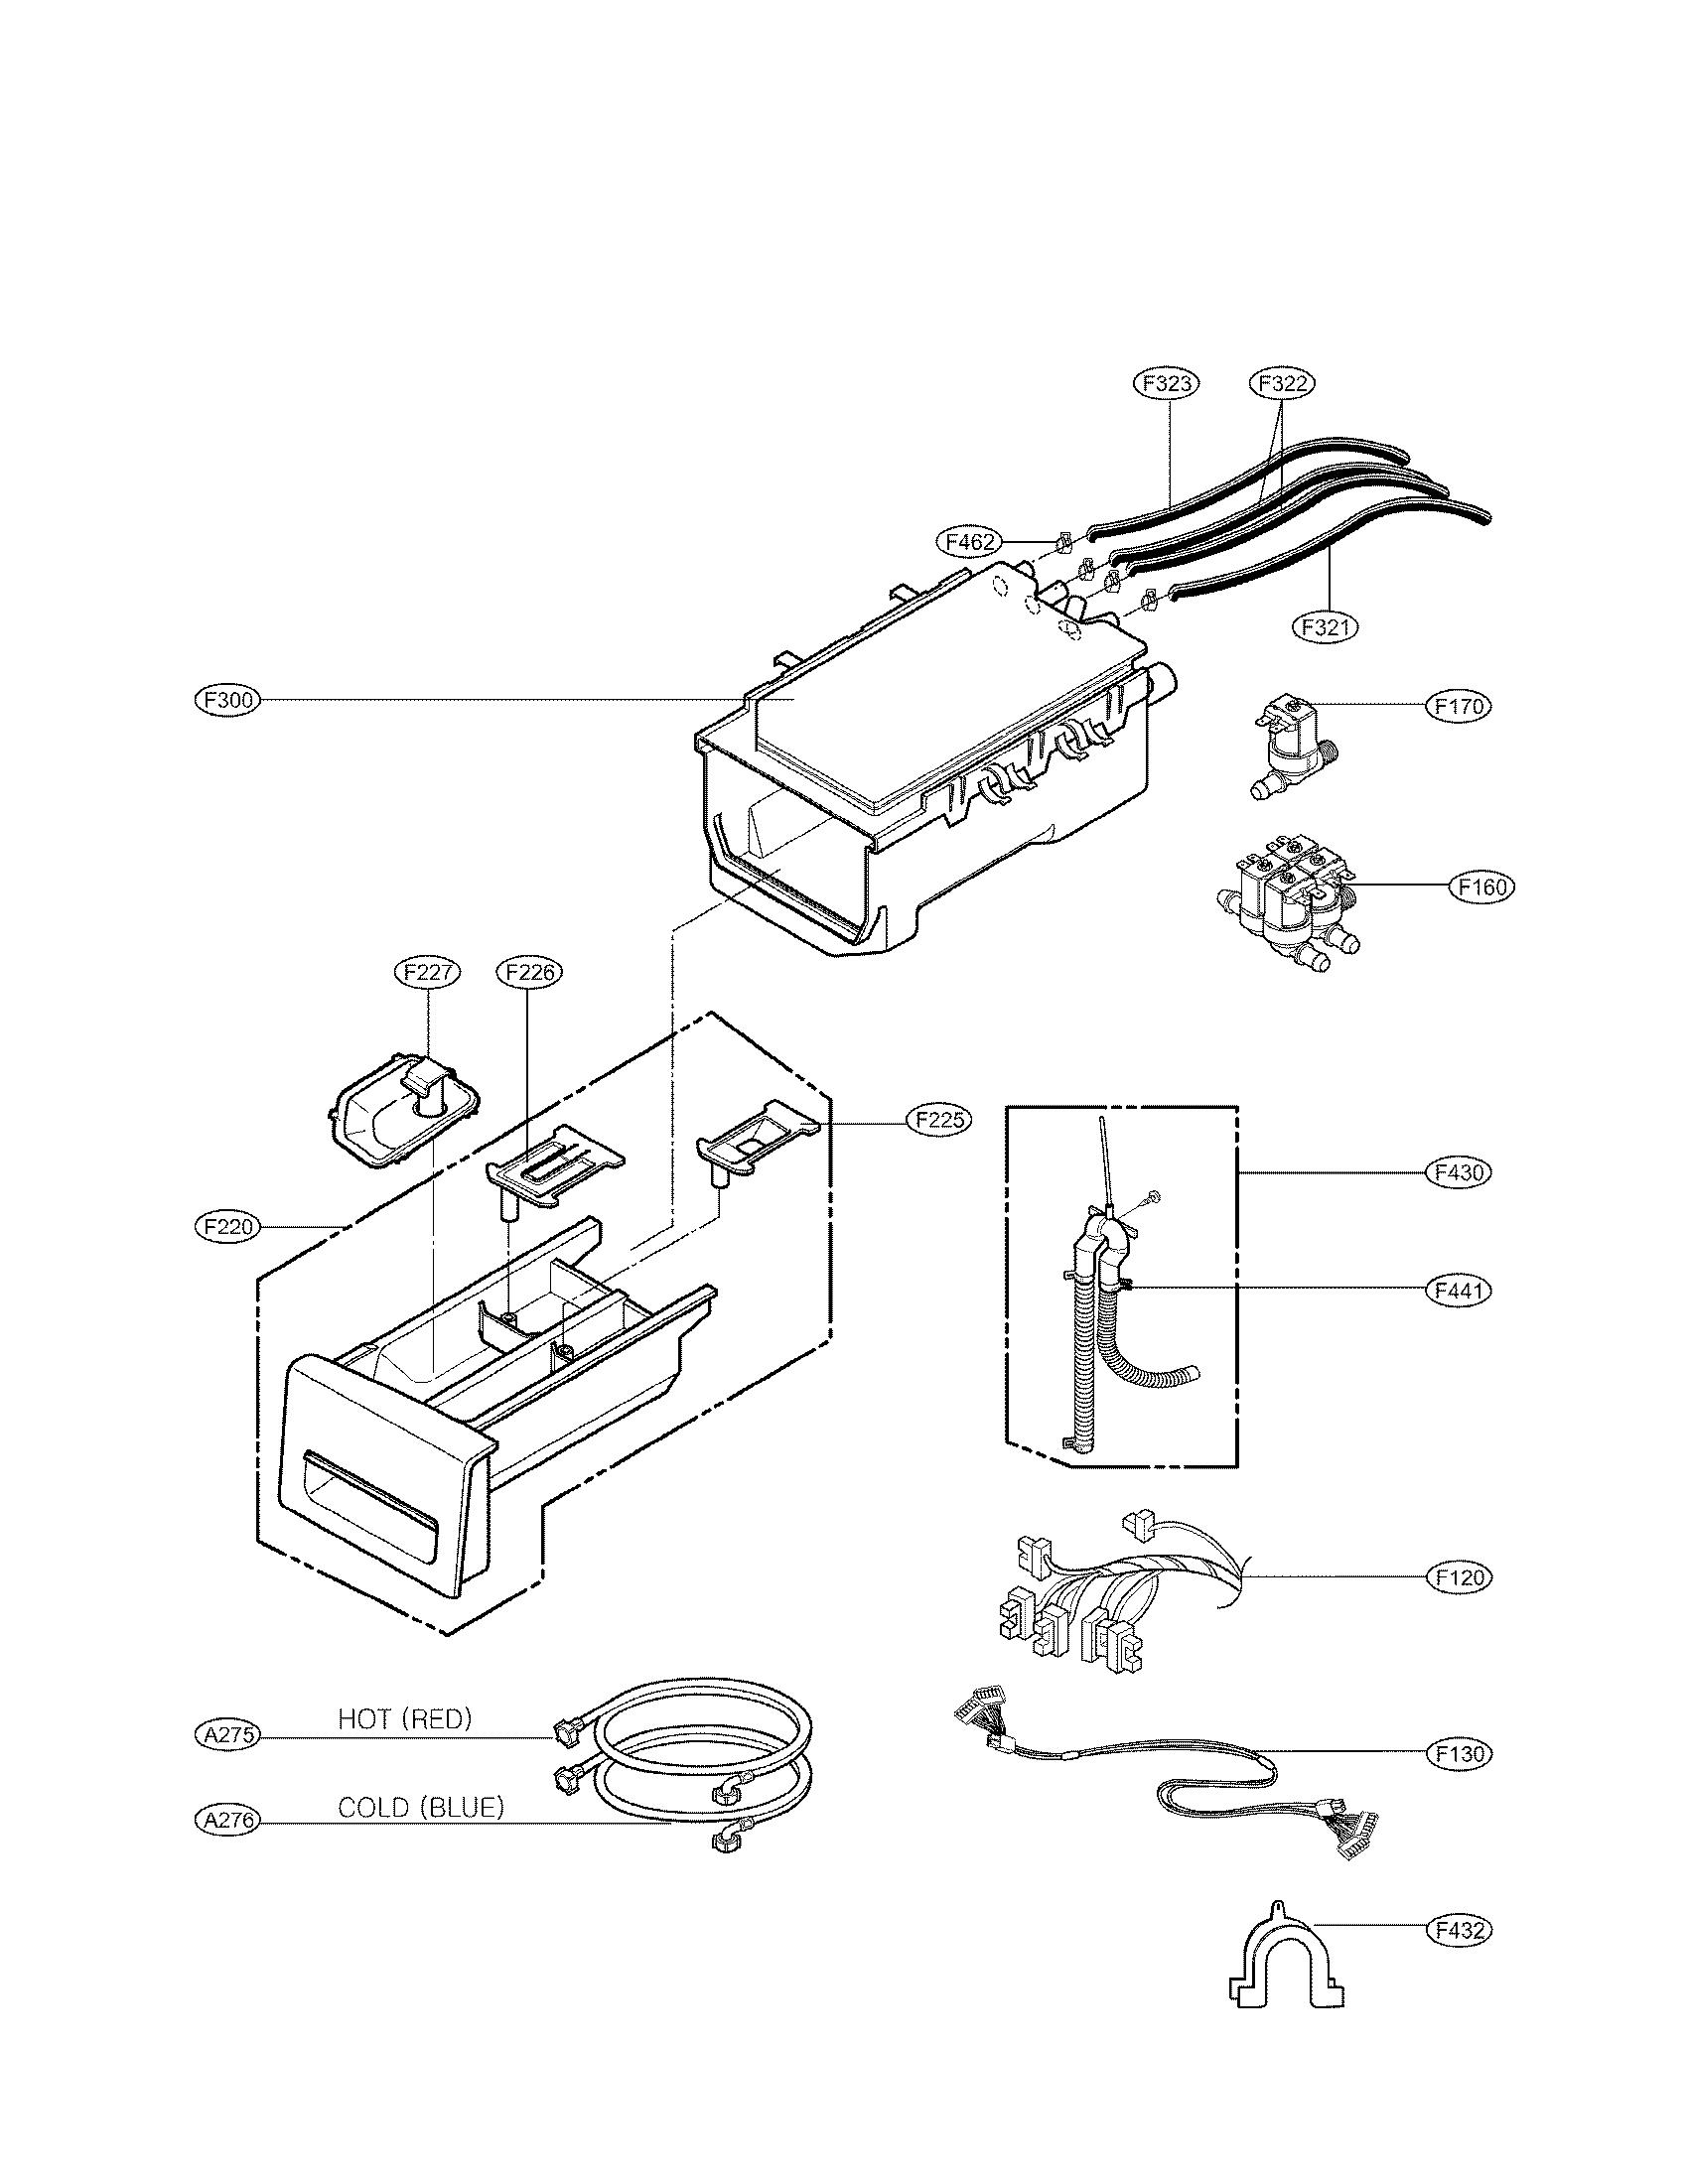 Lg model WM3987HW residential washers genuine parts